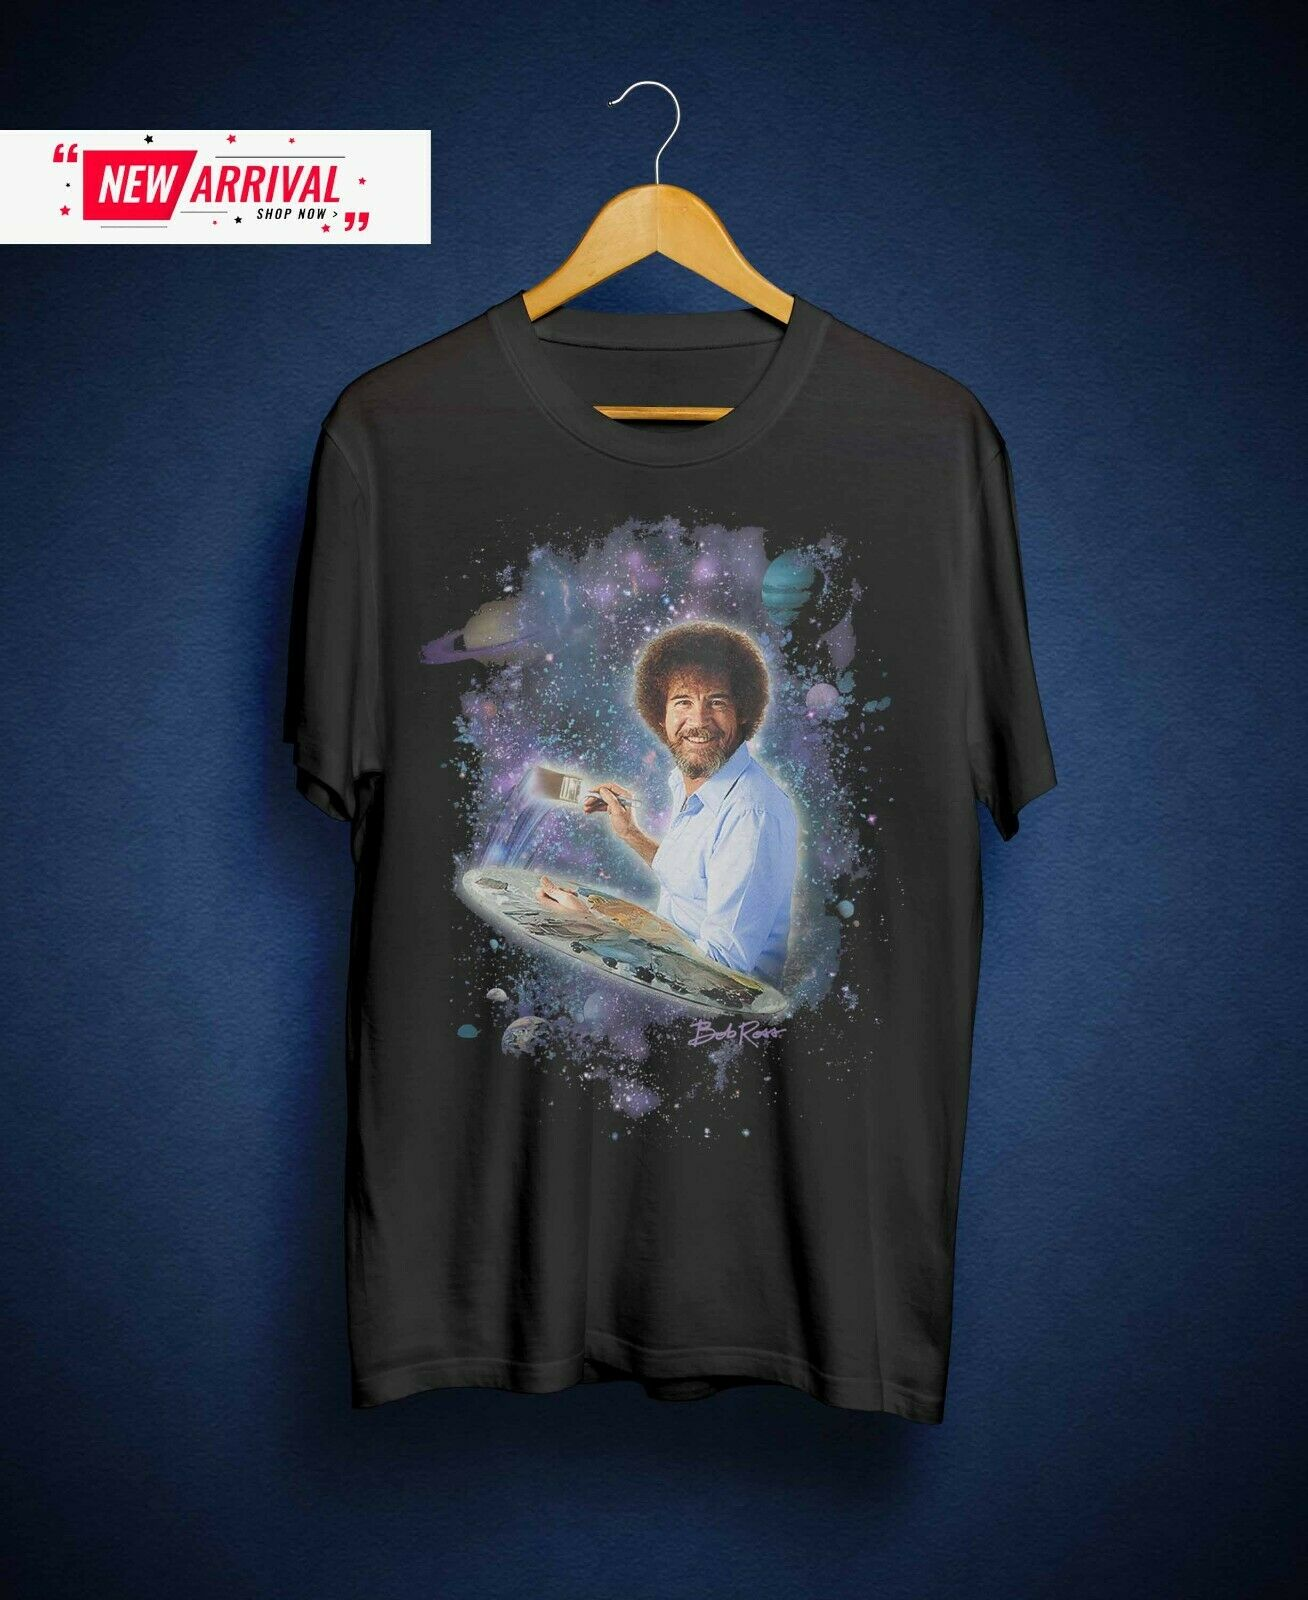 Bob Ross Painting The Galaxy & Adults Black Tee